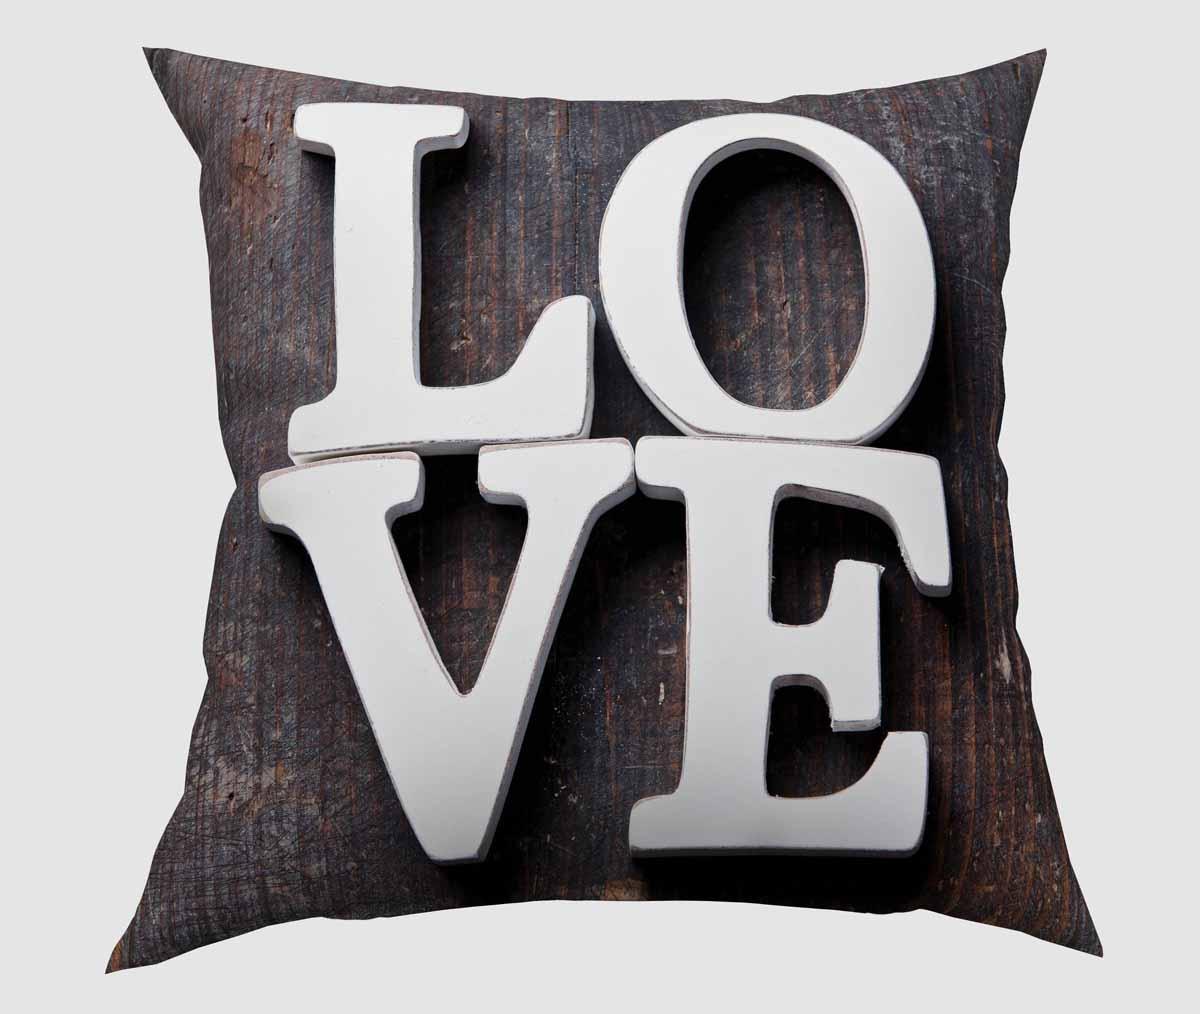 Подушка декоративная Сирень Объемная любовь, 40 х 40 см подушка декоративная сирень анютины глазки 40 х 40 см